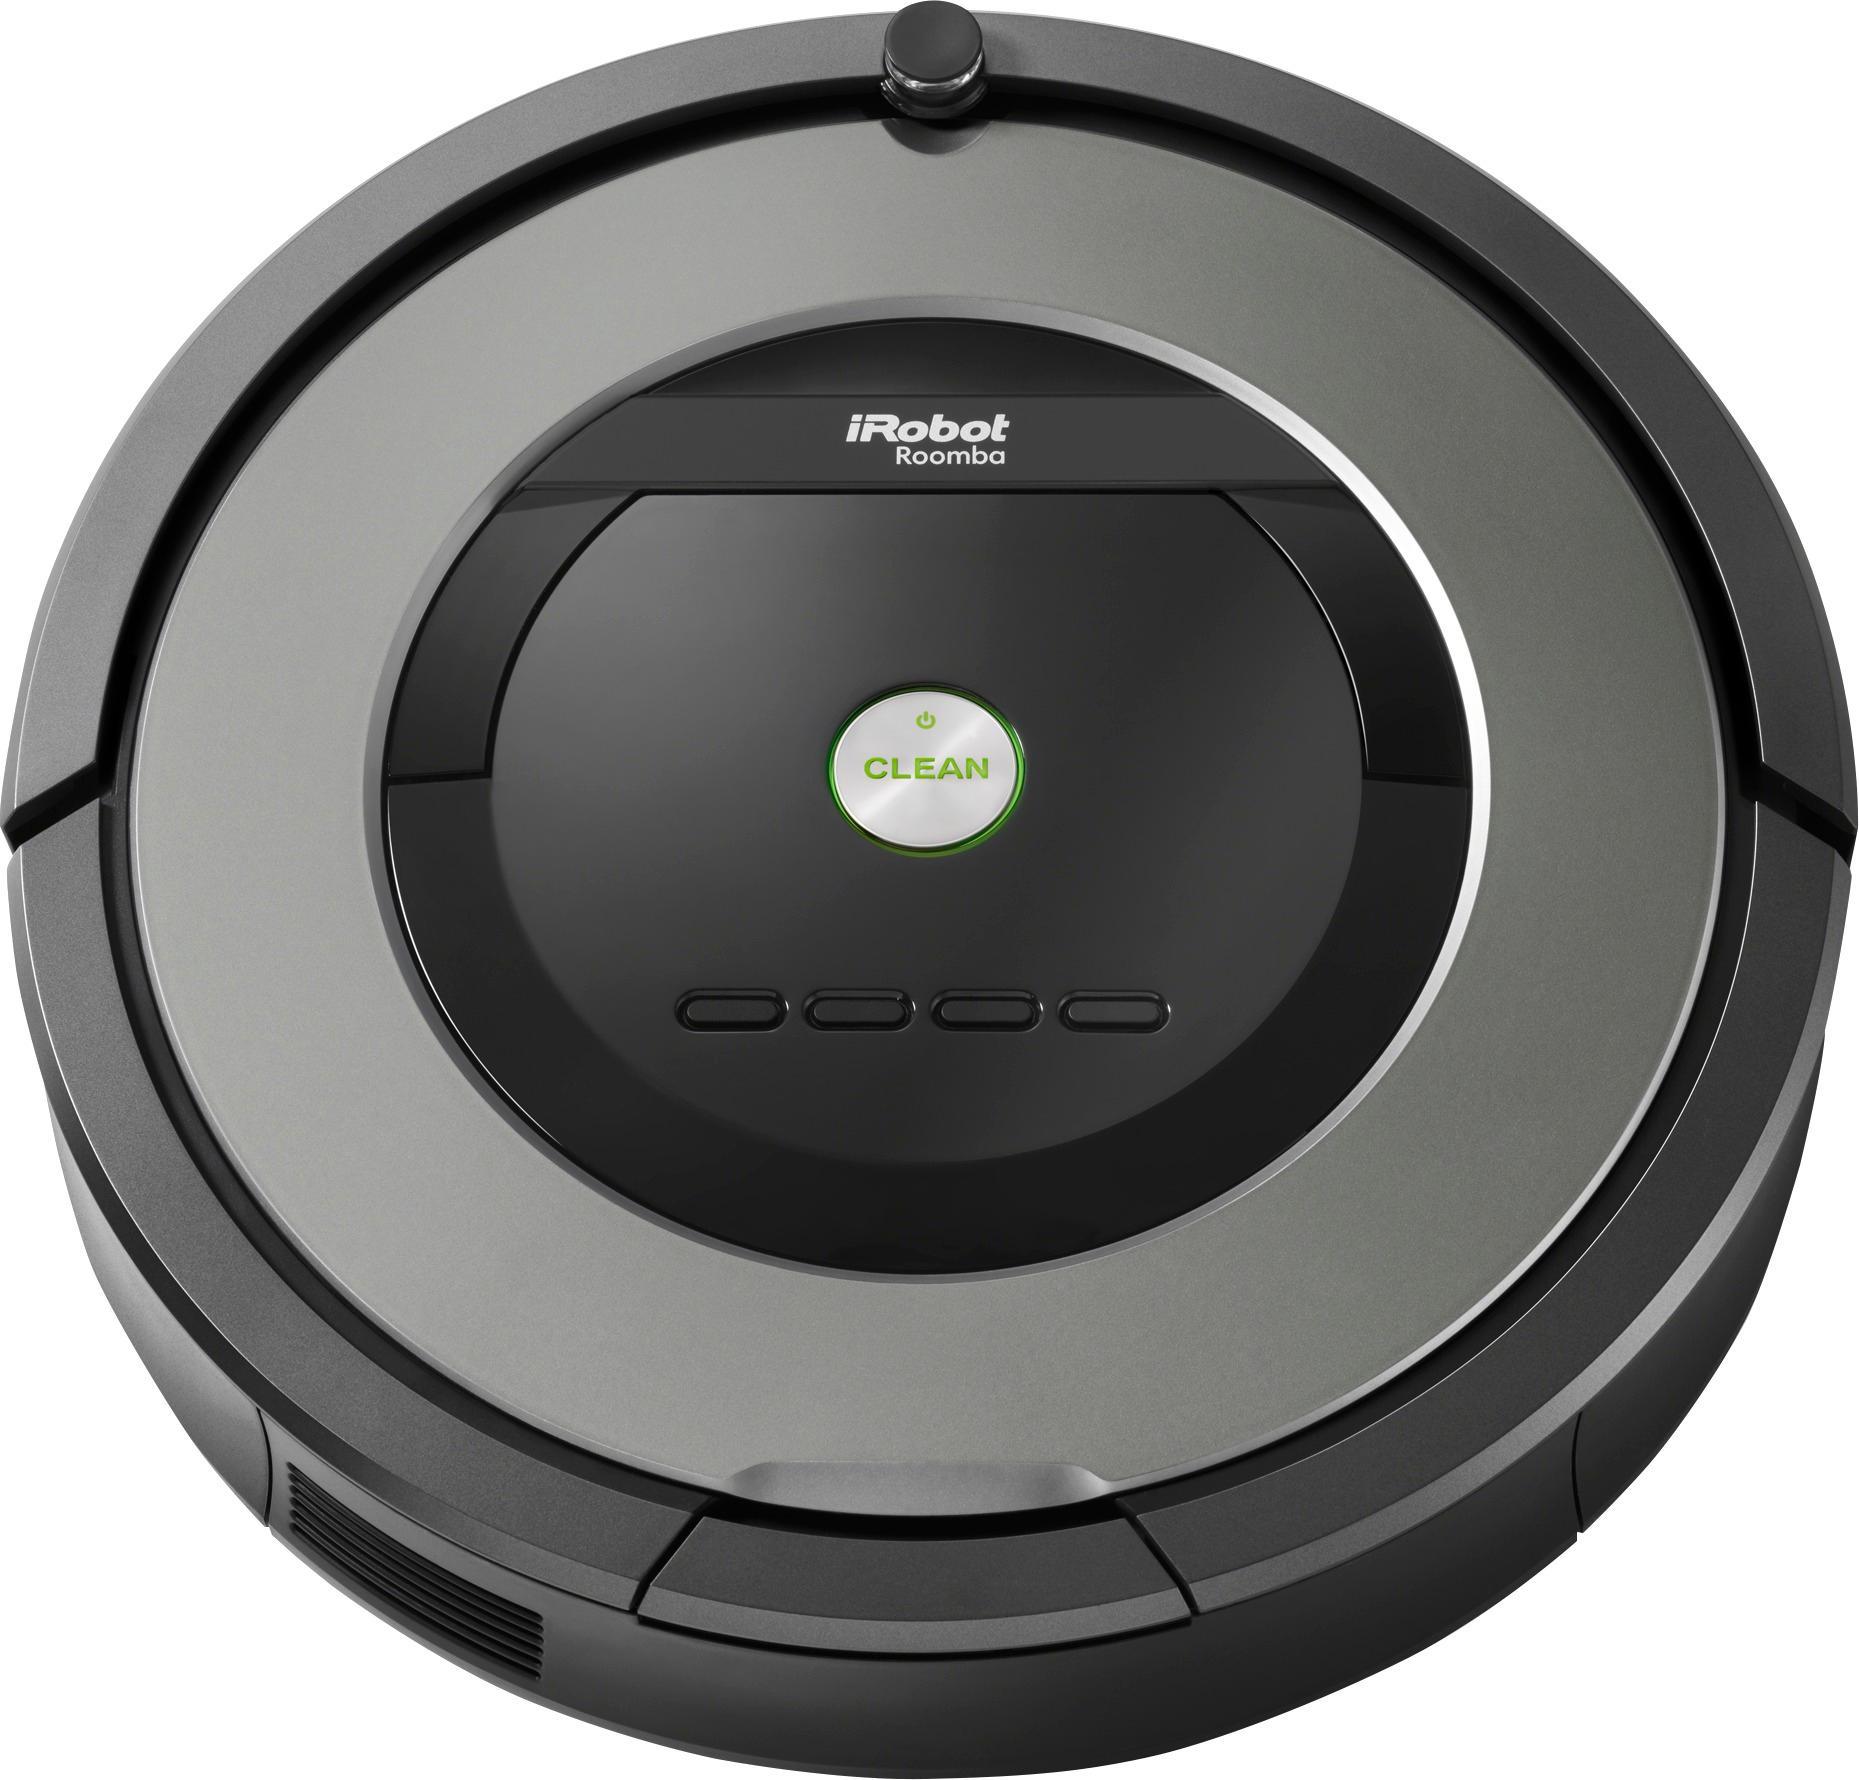 iRobot - Roomba 877 Self-Charging Robot Vacuum - Black/gray